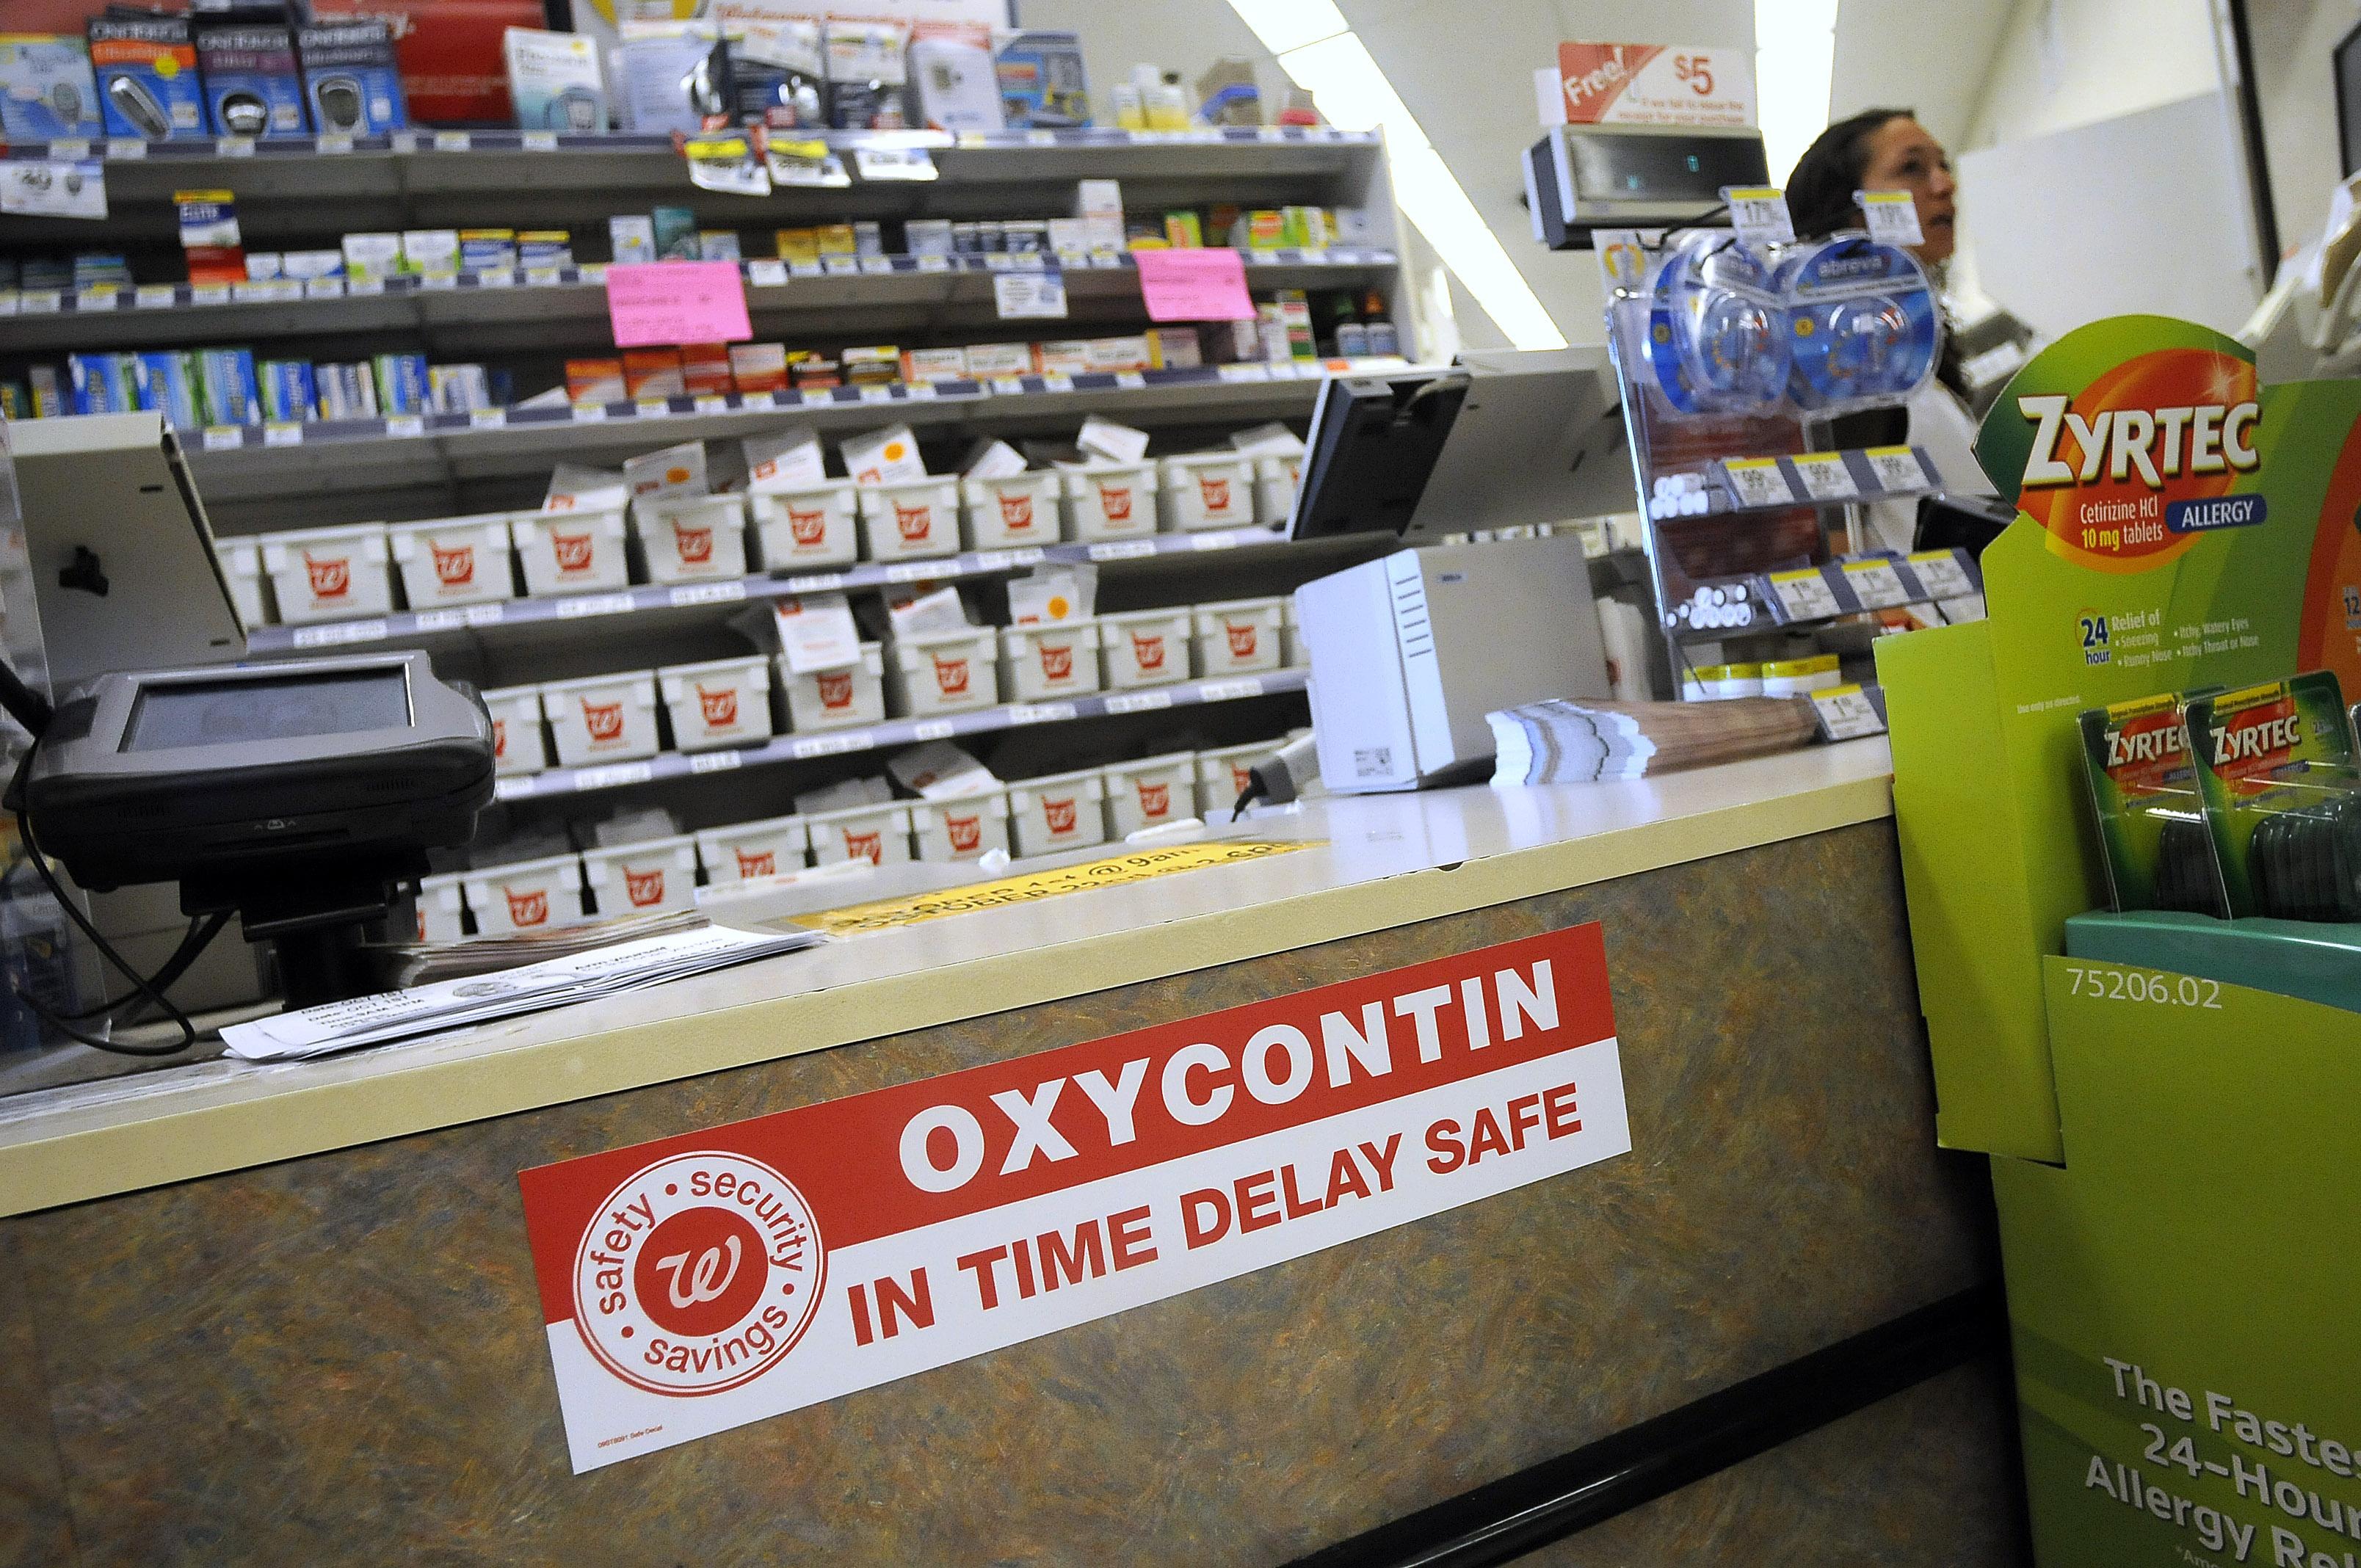 walgreens hopes special safes suppress oxycontin robberies the walgreens hopes special safes suppress oxycontin robberies the review